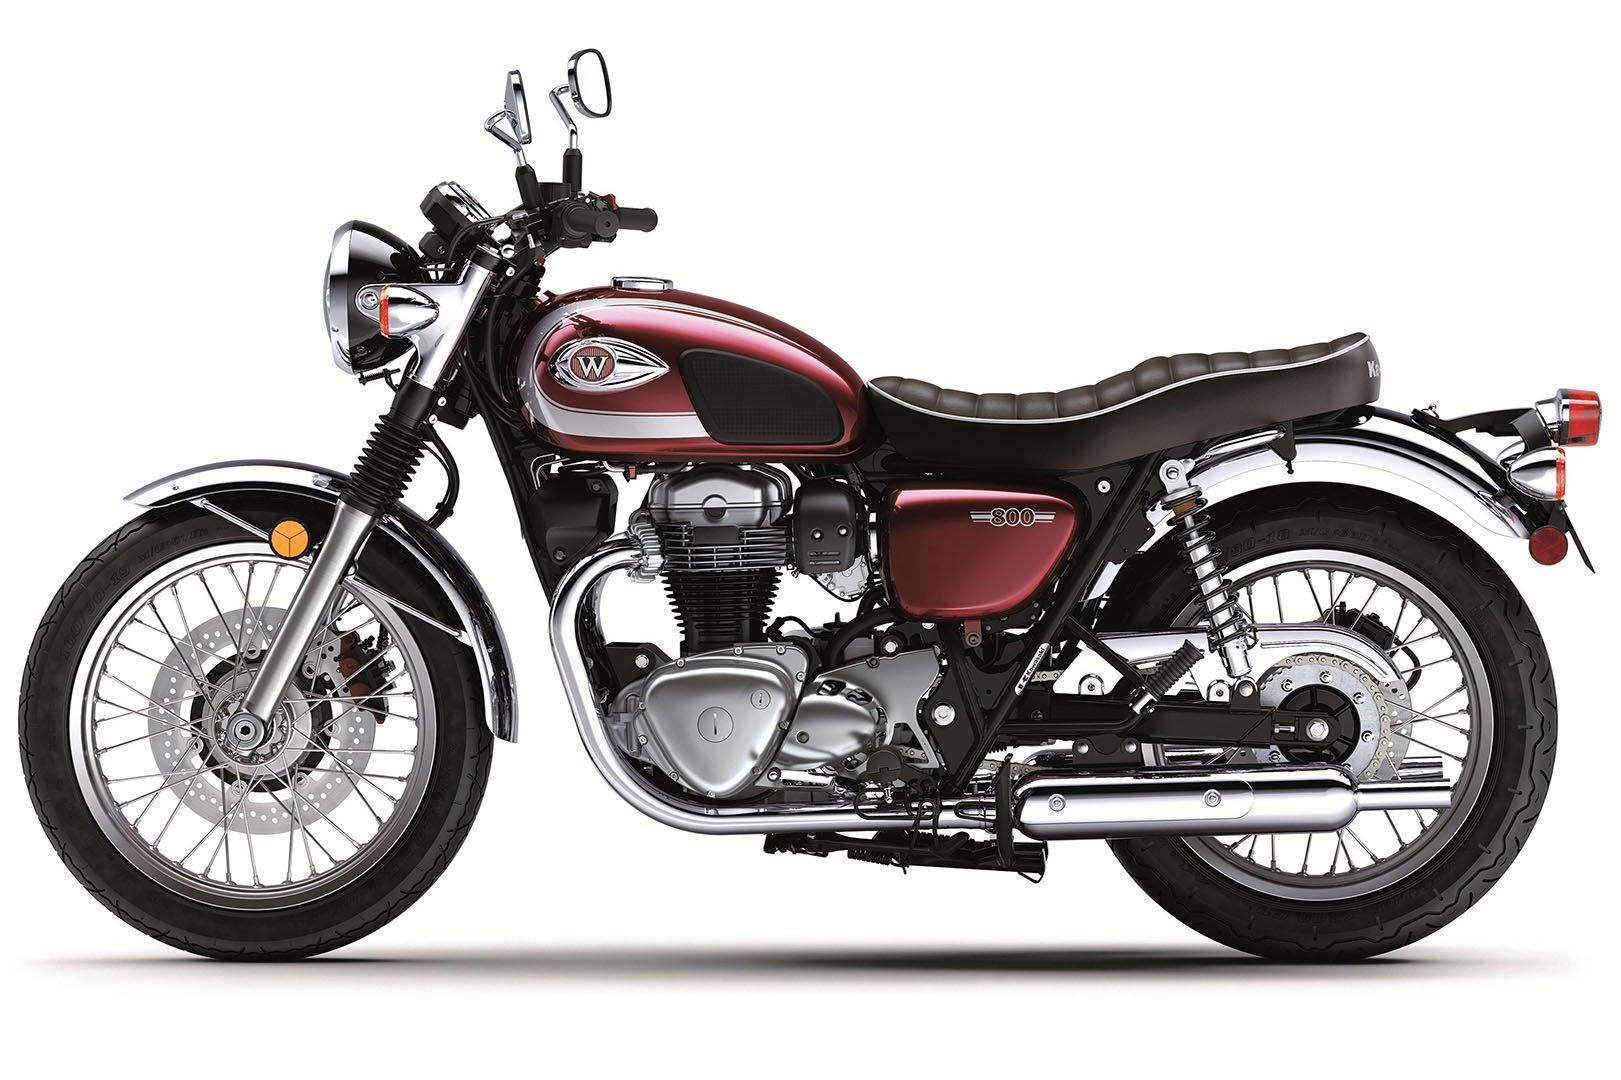 2020 Kawasaki W800 First Ride Review - Price